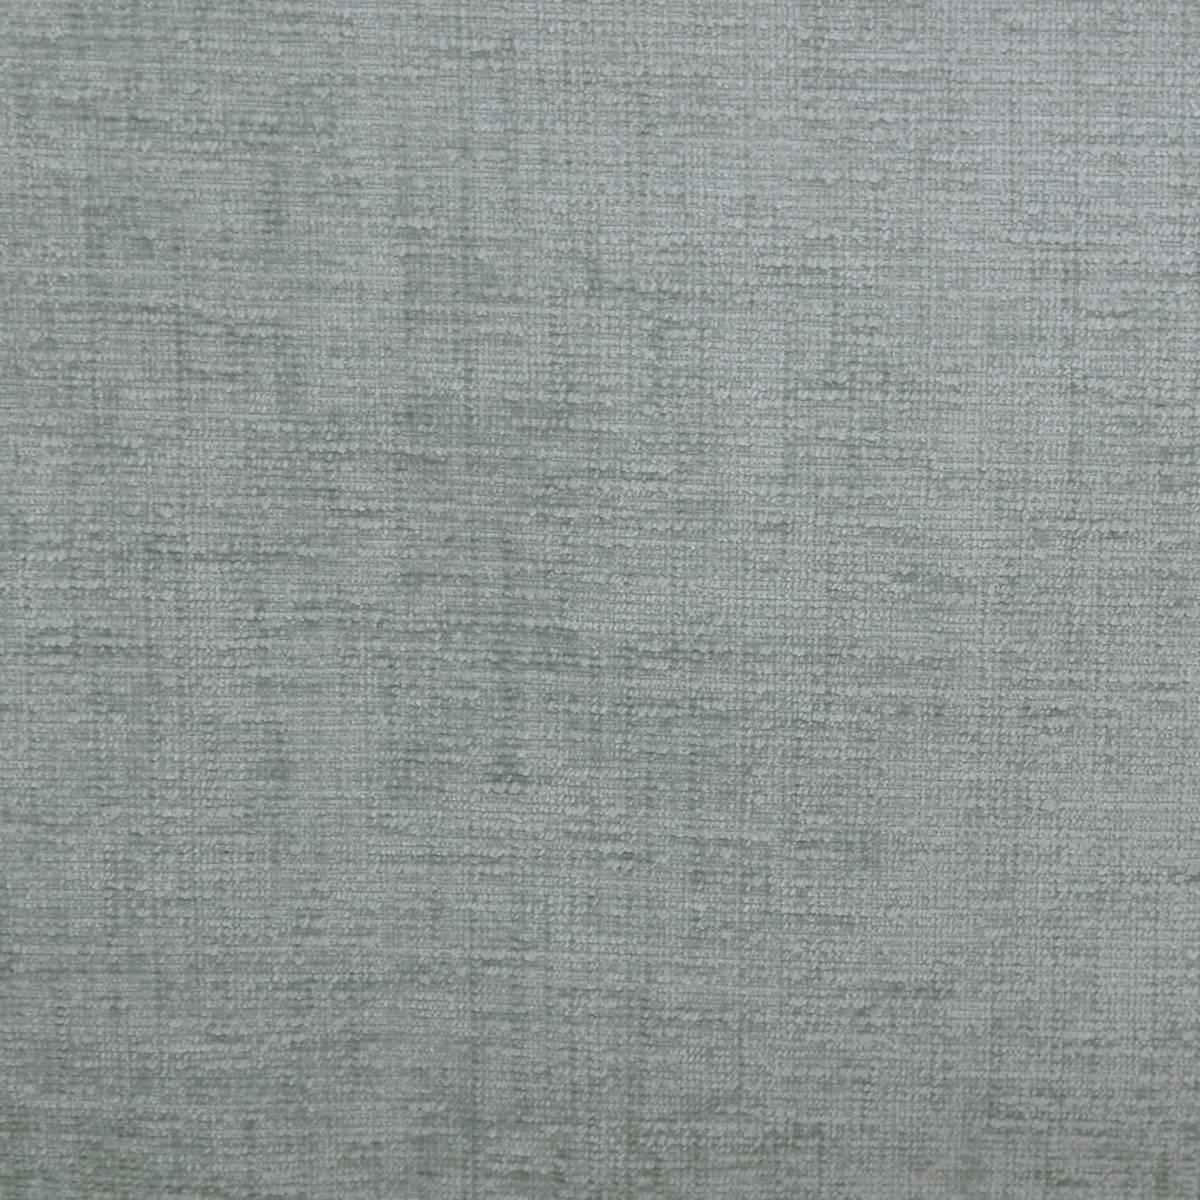 Prestigious Textiles Zephyr Fabric - Cambridge Product Code: 7110/734